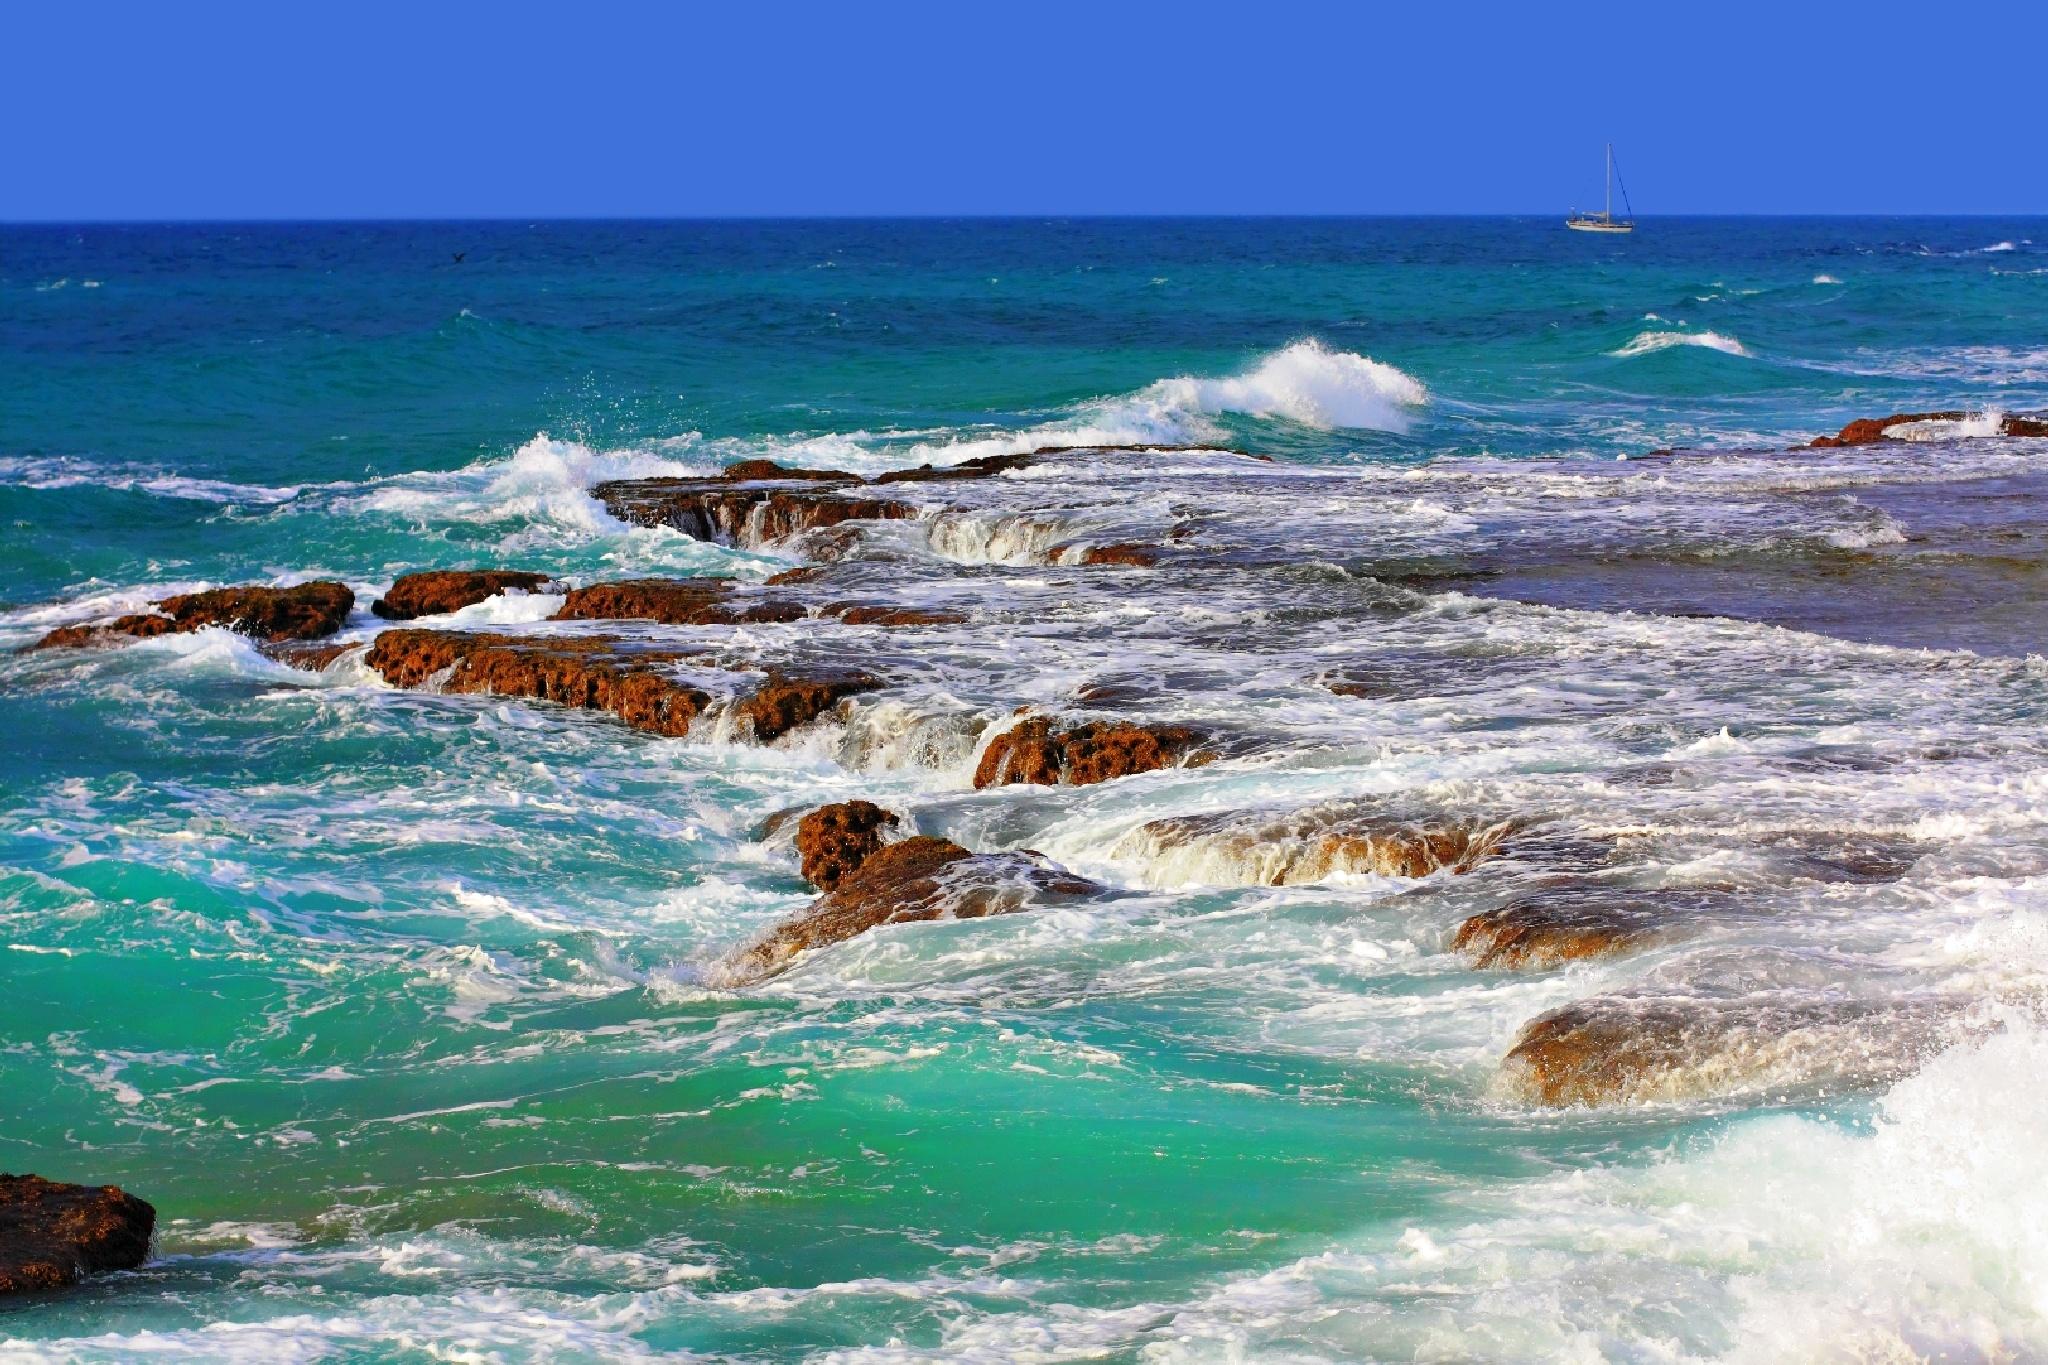 Mediterranean Sea and yacht .Tel Aviv.Israel by Konstantin Bolotinsky